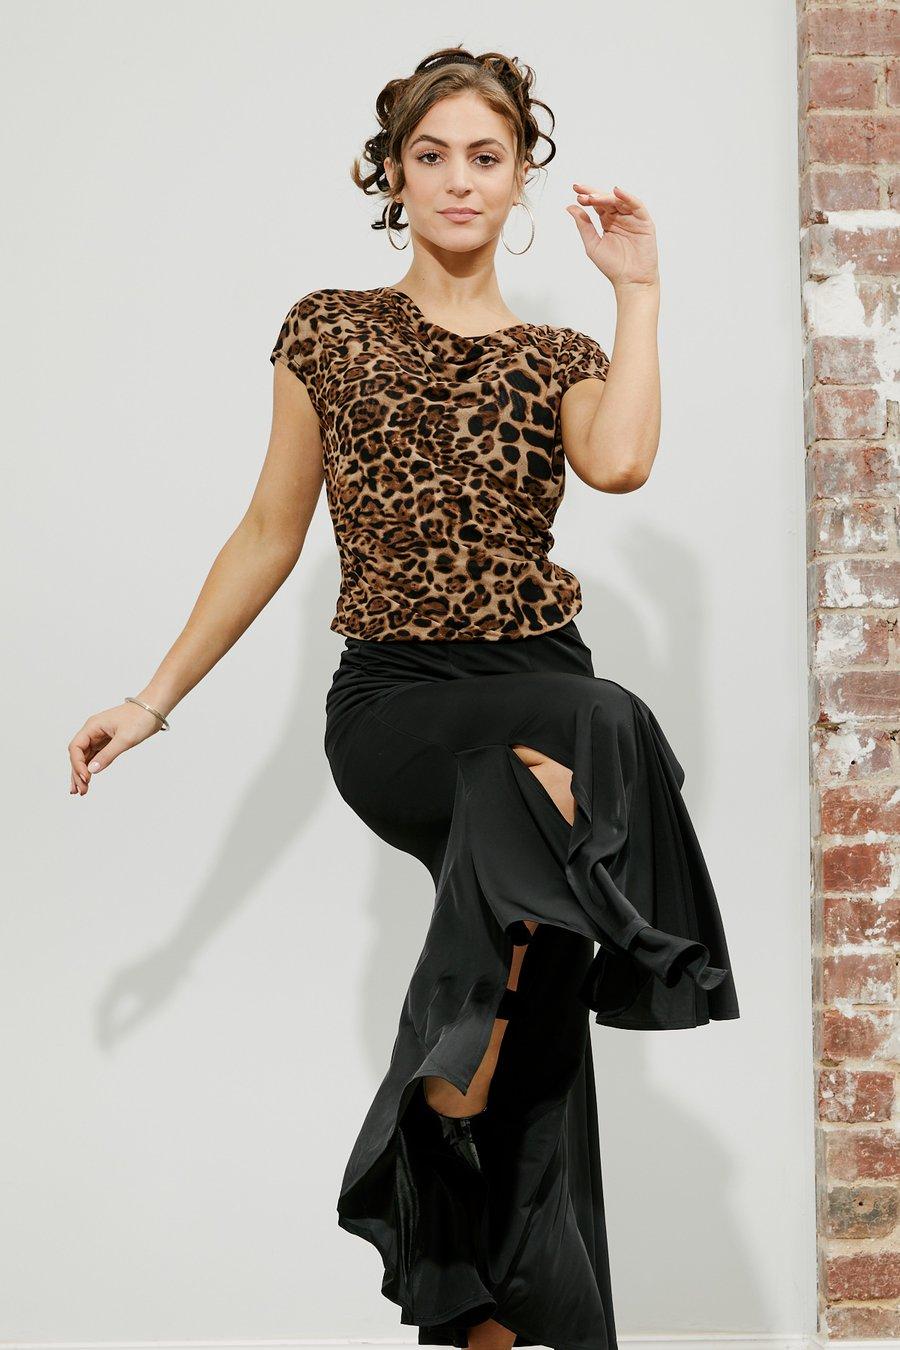 Image of Rikoko Top - Animal E1289/E7153 Dancewear latin ballroom